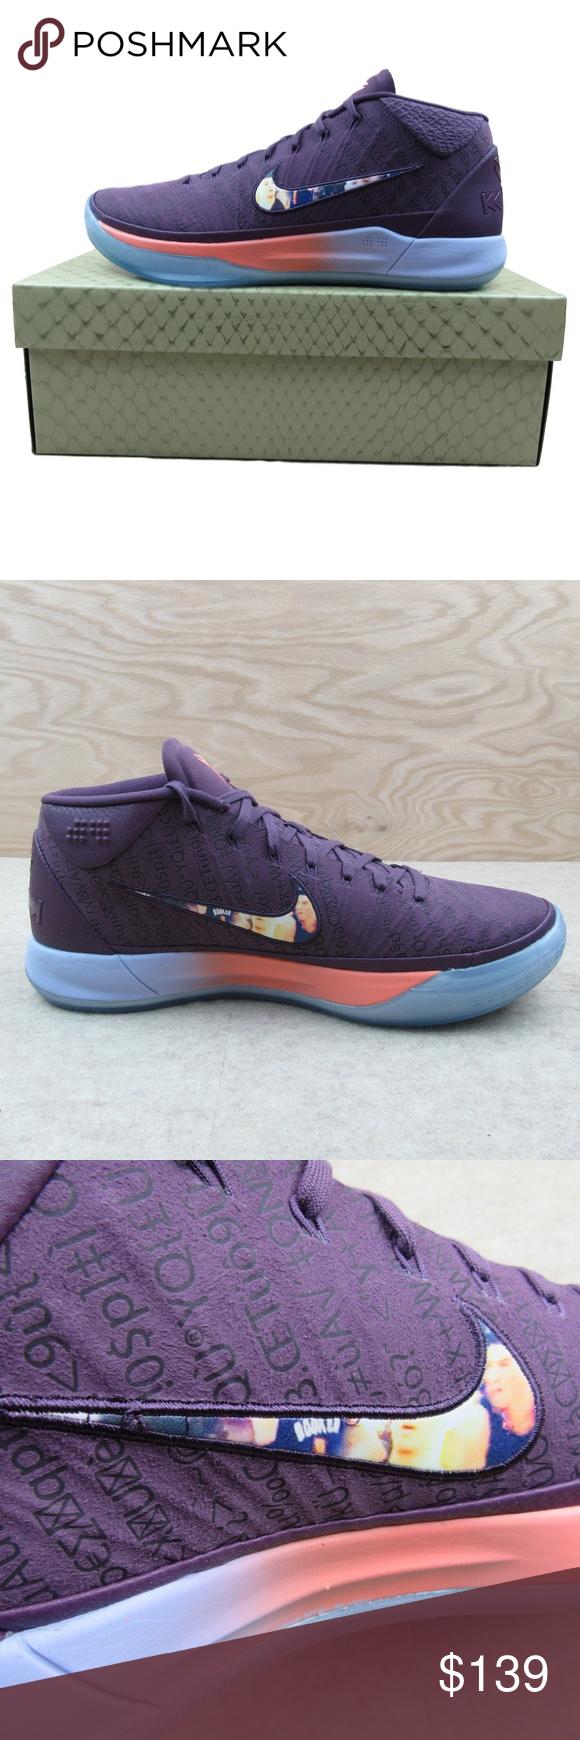 size 40 66a14 82e22 Kobe A.D. Devin Booker PE Size 11 Mens Pro Purple Kobe A.D. ...